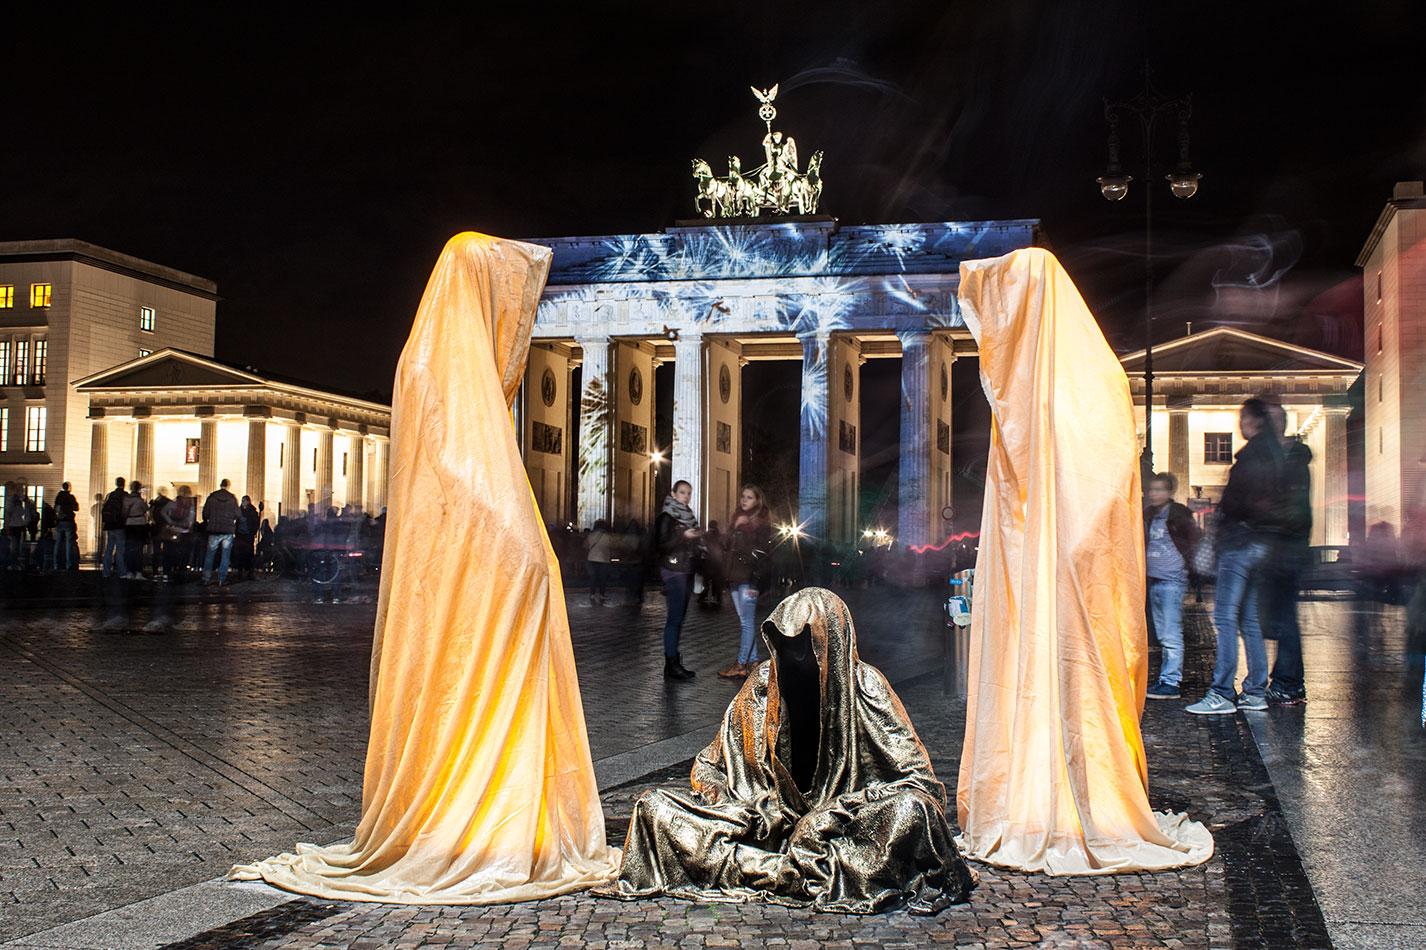 festival-of-lights-berlin-brandenburg-gate-light-art-show-exhibition-lumina-guardians-of-time-manfred-kili-kielnhofer-contemporary-arts-design-sculpture-3287